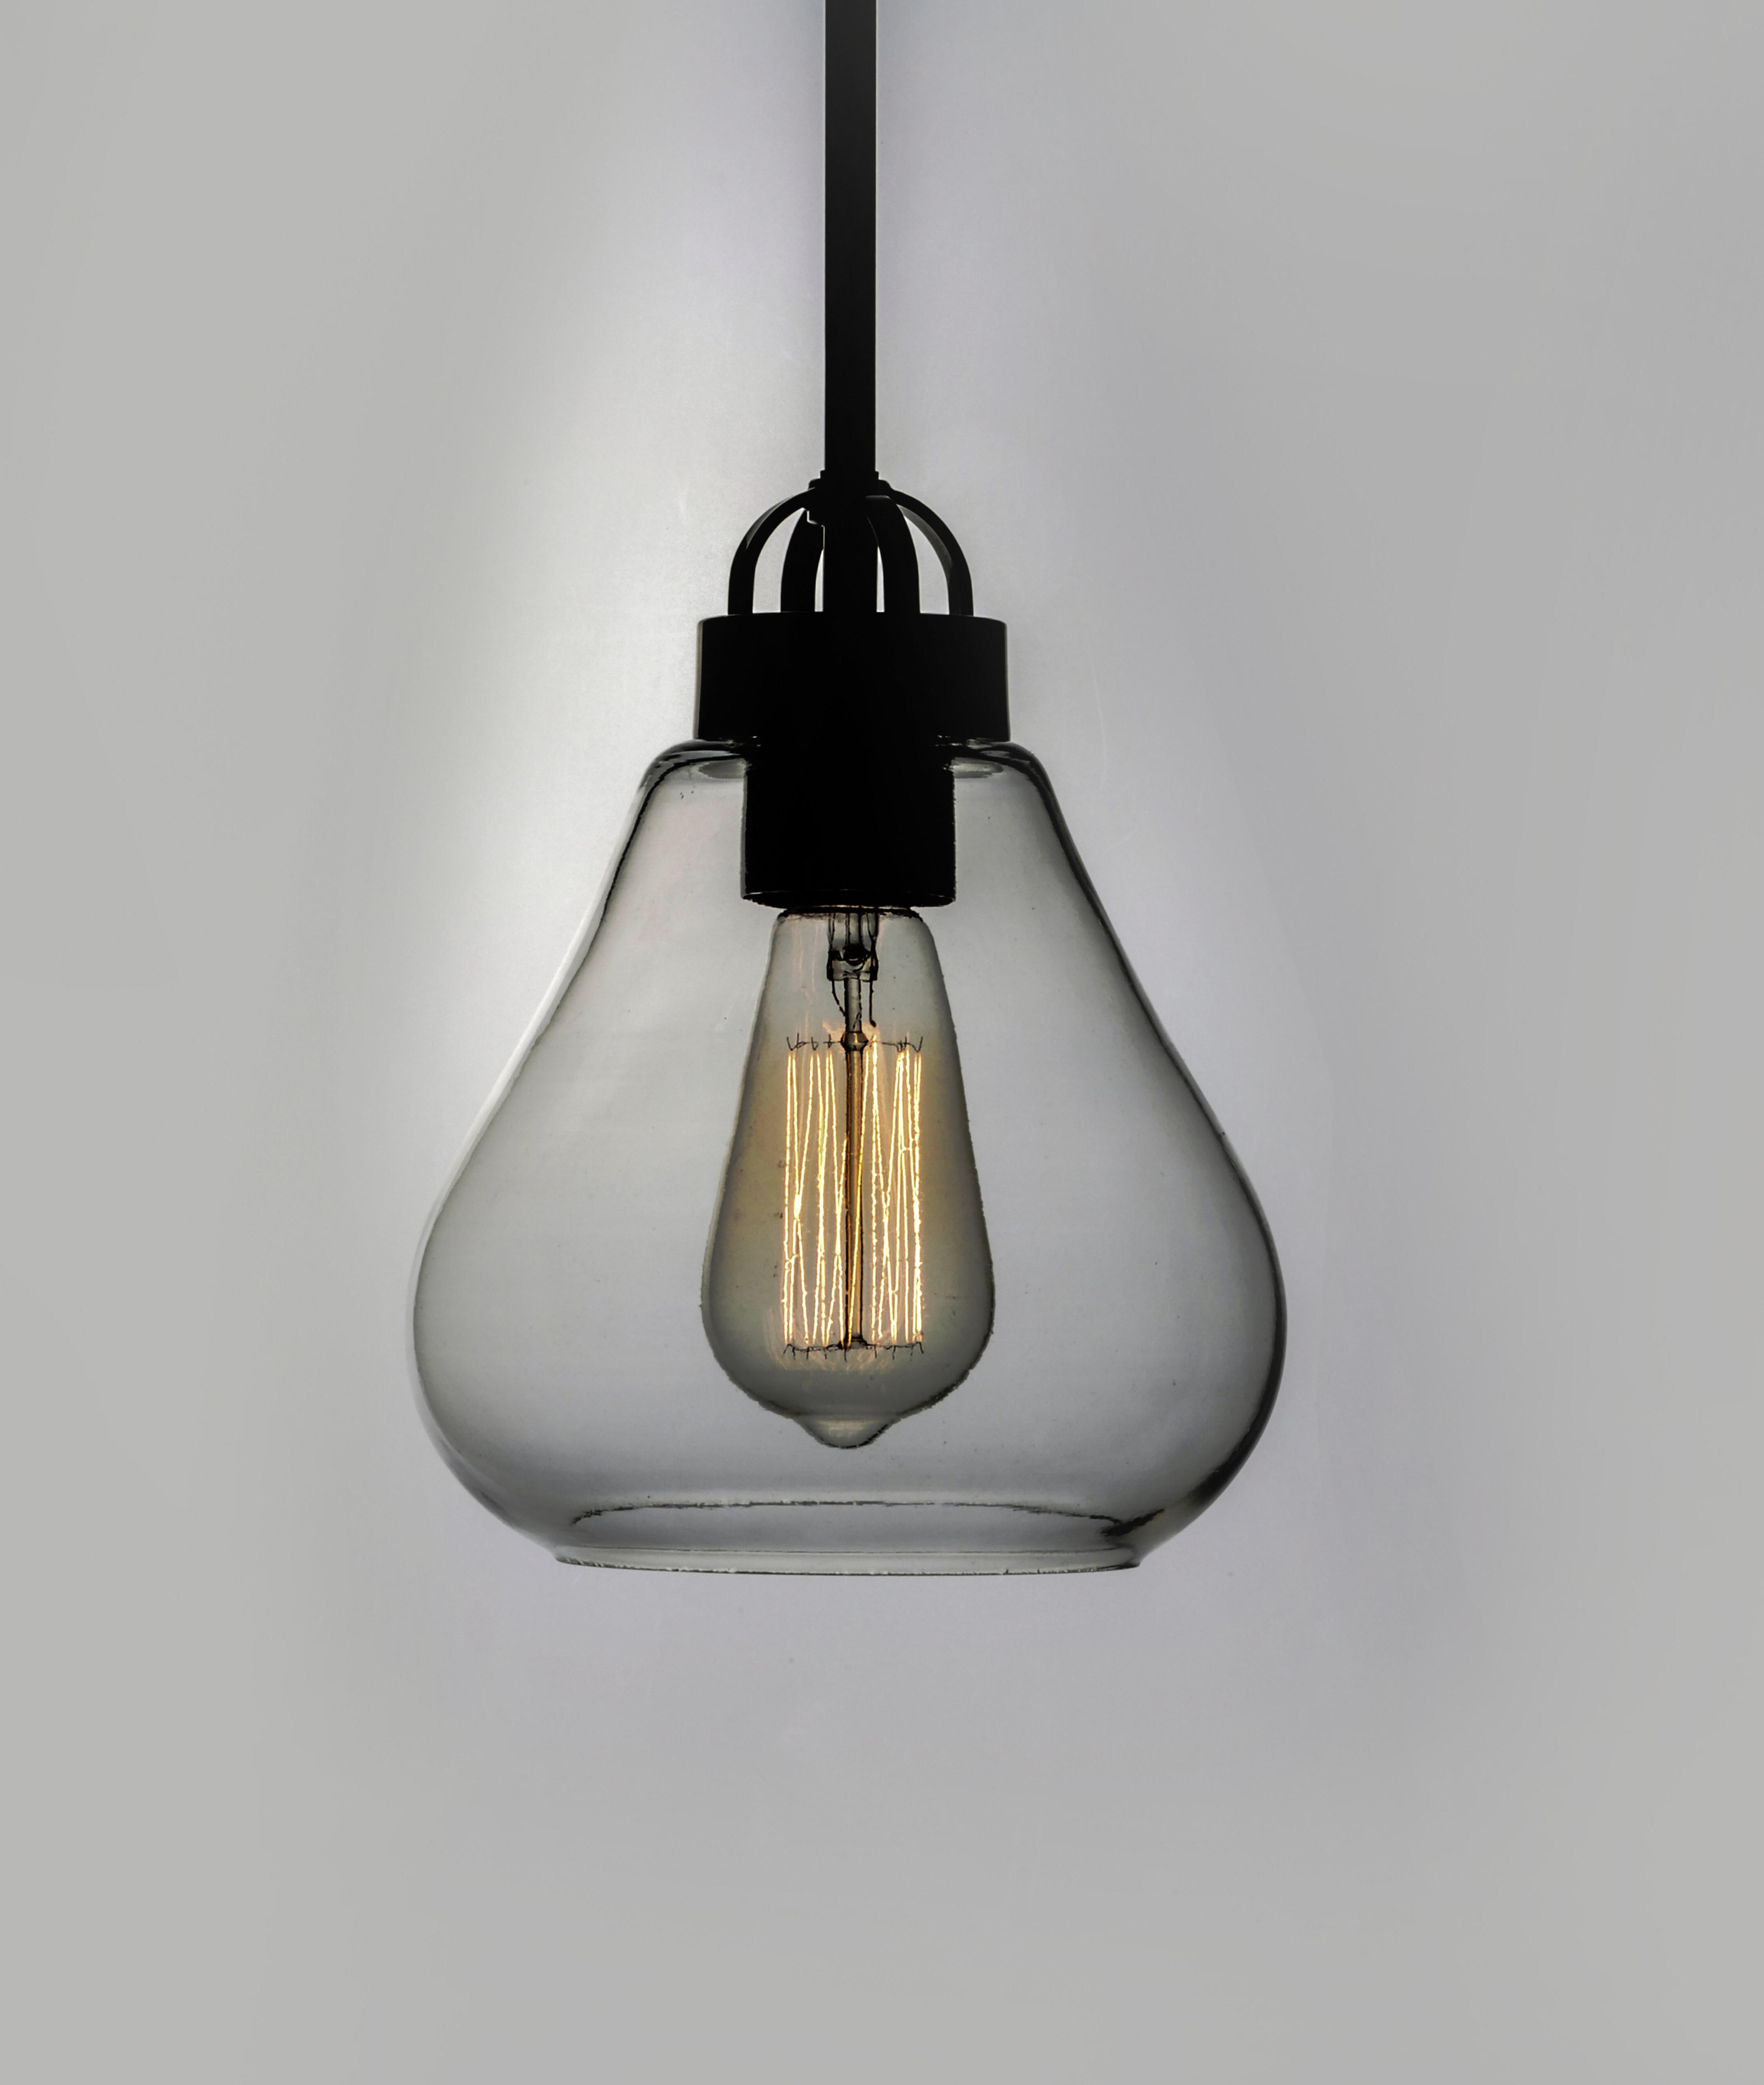 Pewter & Silver & Satin Nickel Pendant Lighting You'll Love Regarding Fashionable Kimsey 1 Light Teardrop Pendants (Gallery 5 of 20)